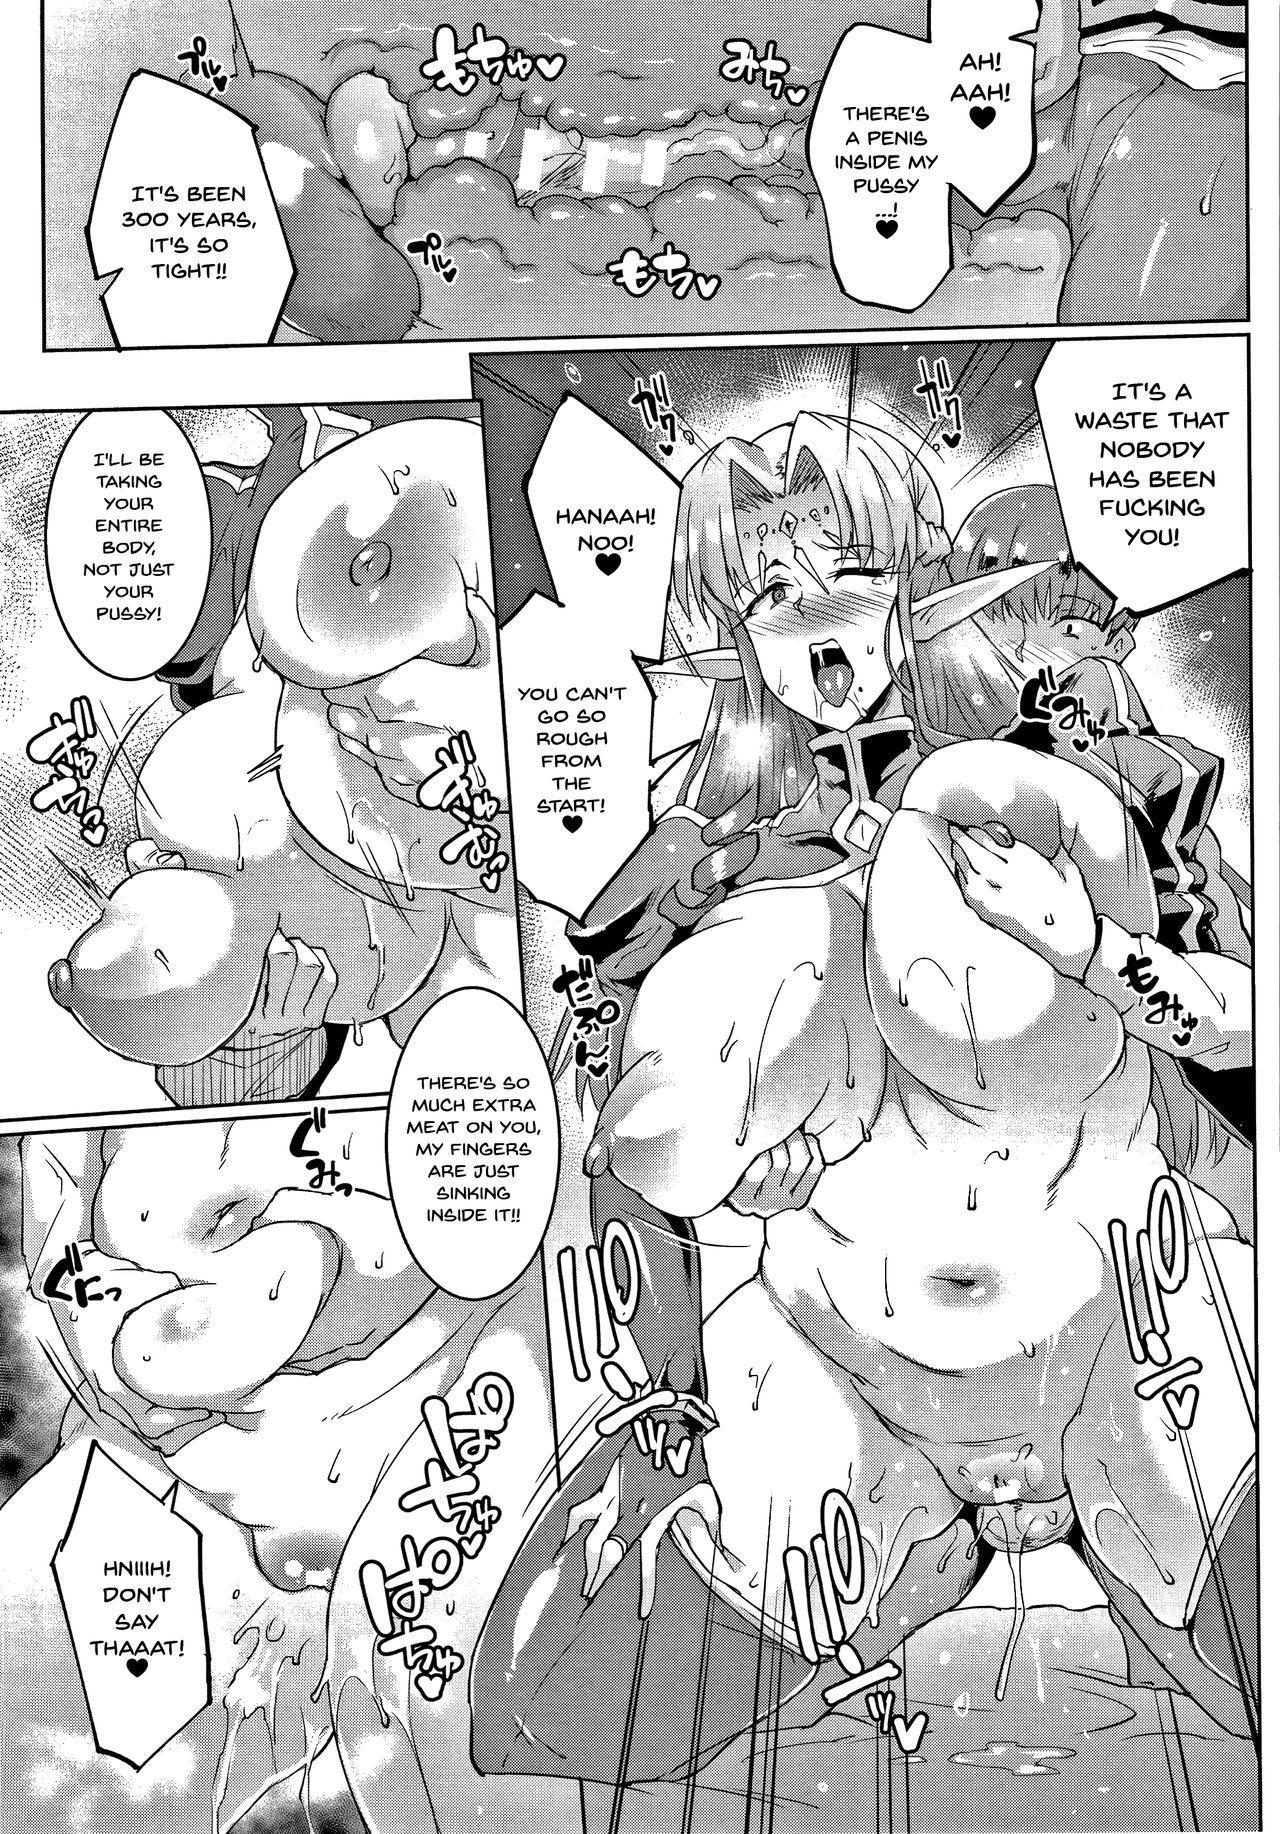 [Fan no Hitori] Sennen Reijou ~ My Lady, My Master ~  Ch.1-3 [English] {Doujins.com} 45